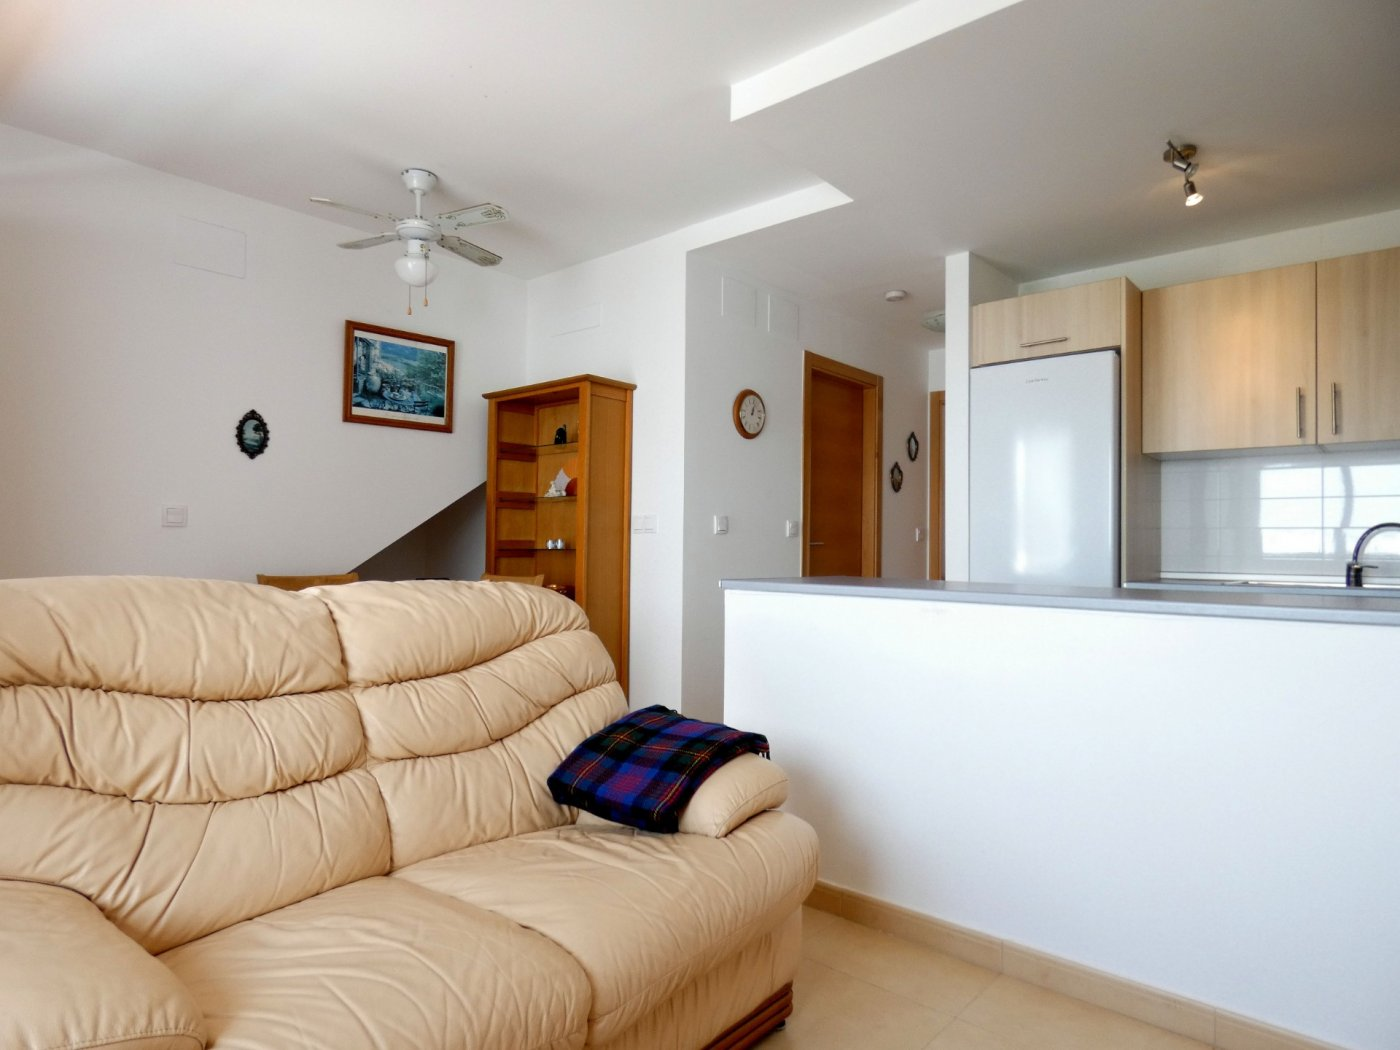 Gallery Image 17 of Key-Ready 2 Bedroom Apartment Overlooking the Citrus Groves in Jardin 10, Condado de Alhama